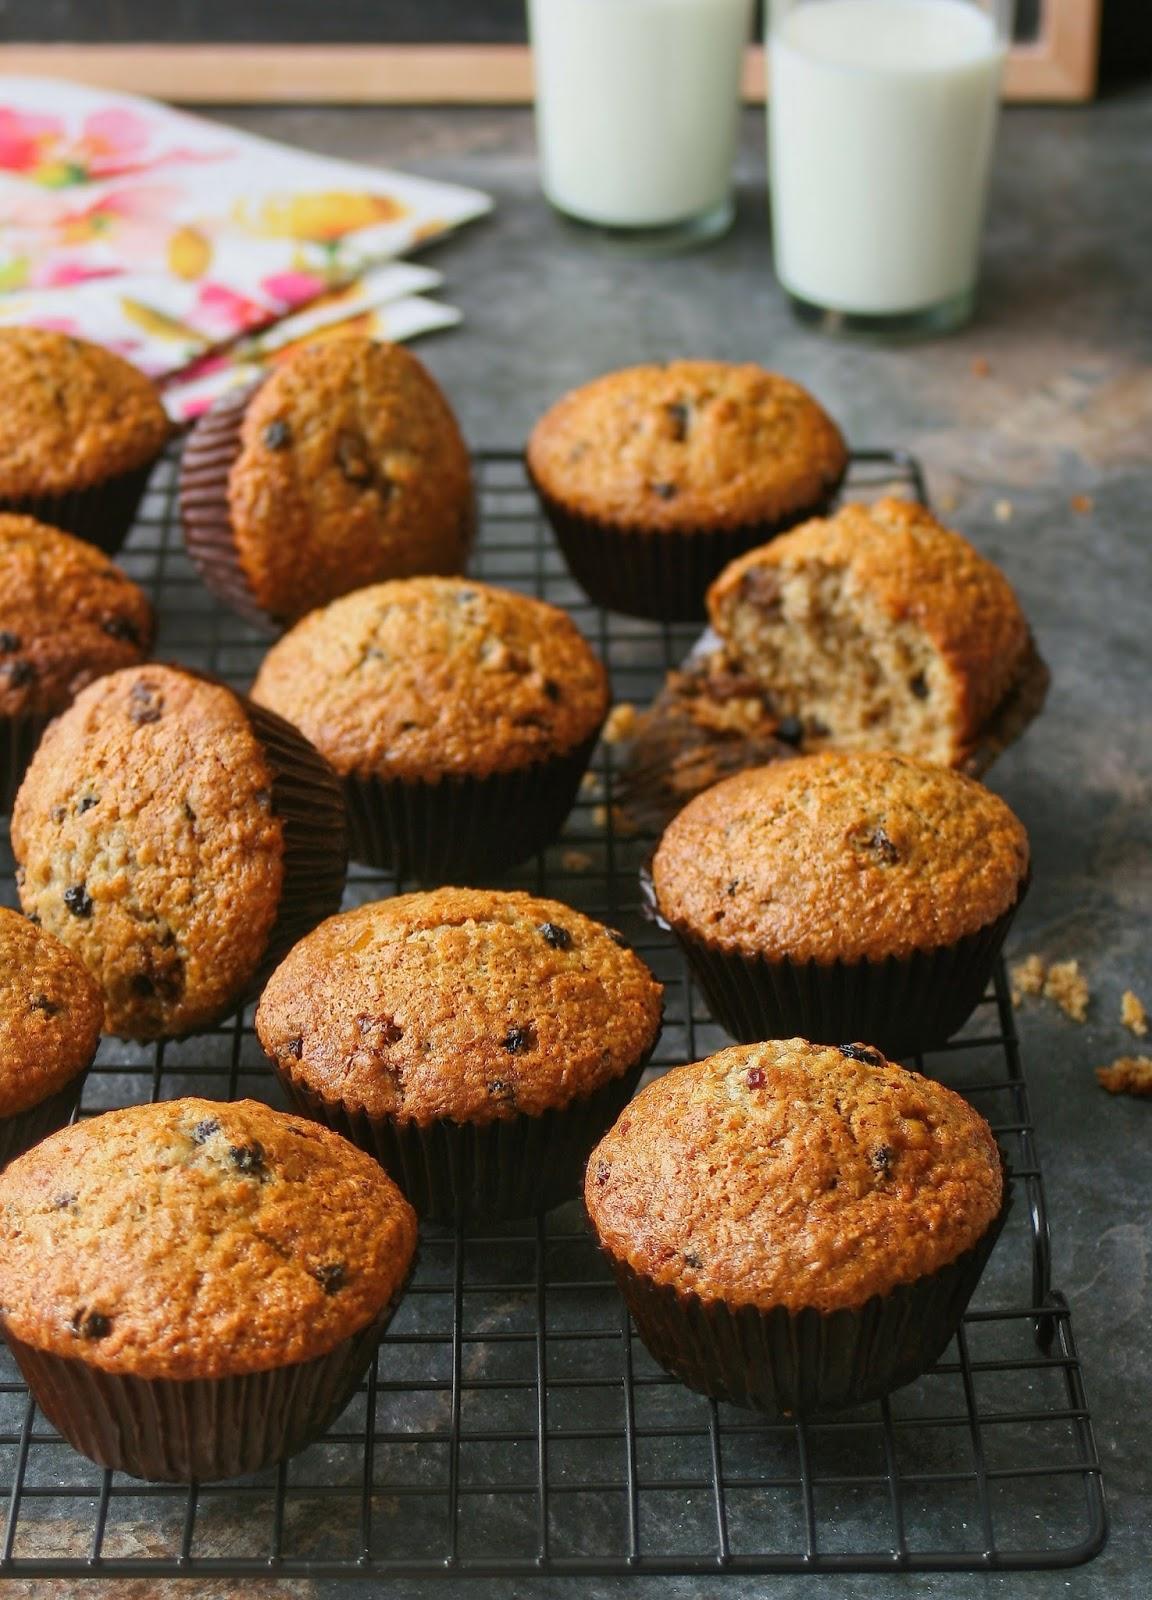 Lunchbox ideas for kids, bran muffins.